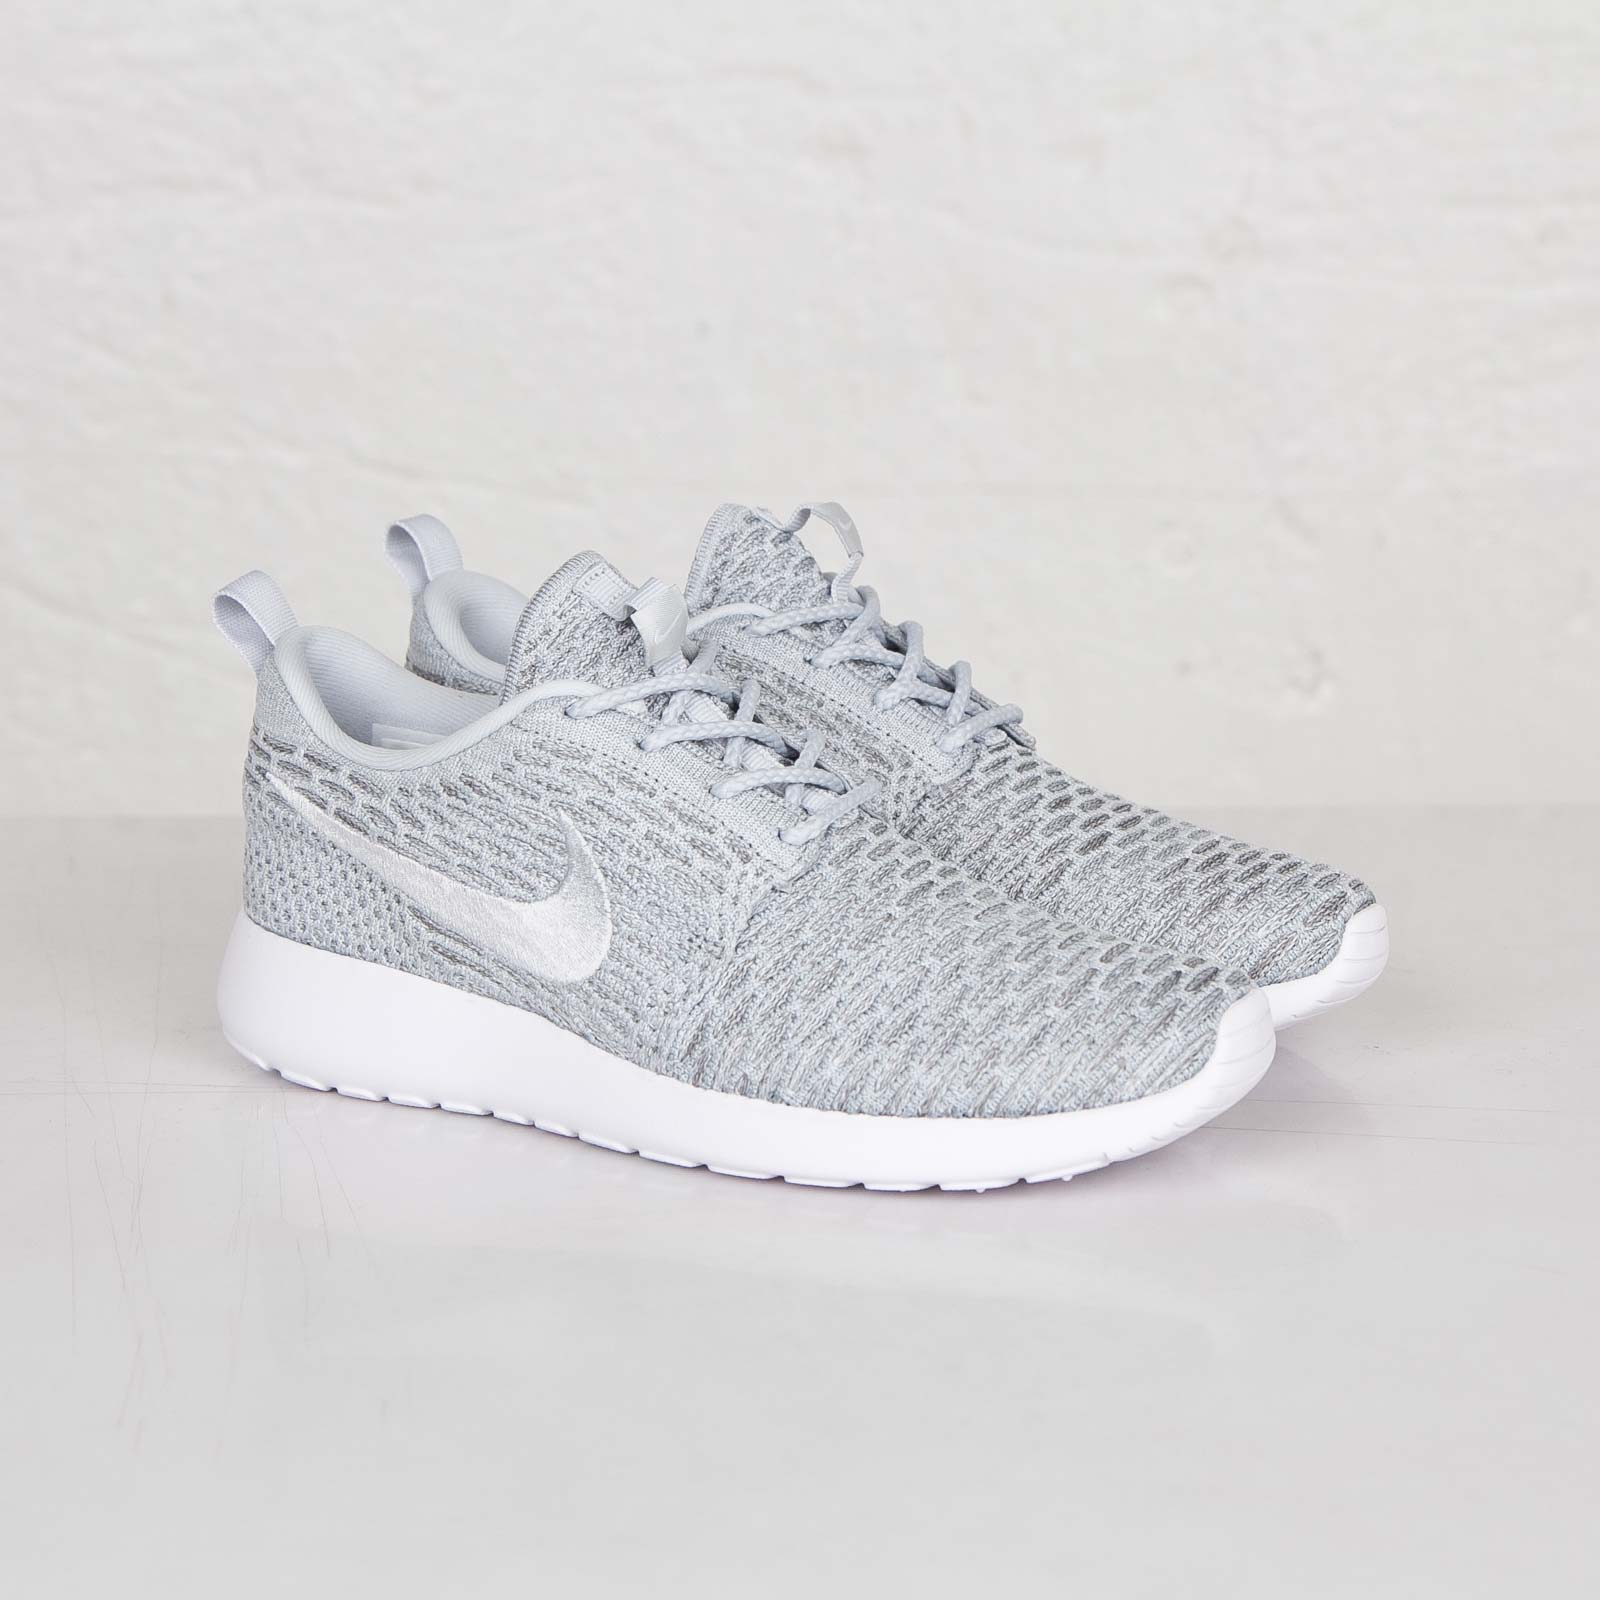 0956c95b85f2 Nike Wmns Roshe Run Flyknit - 704927-002 - Sneakersnstuff